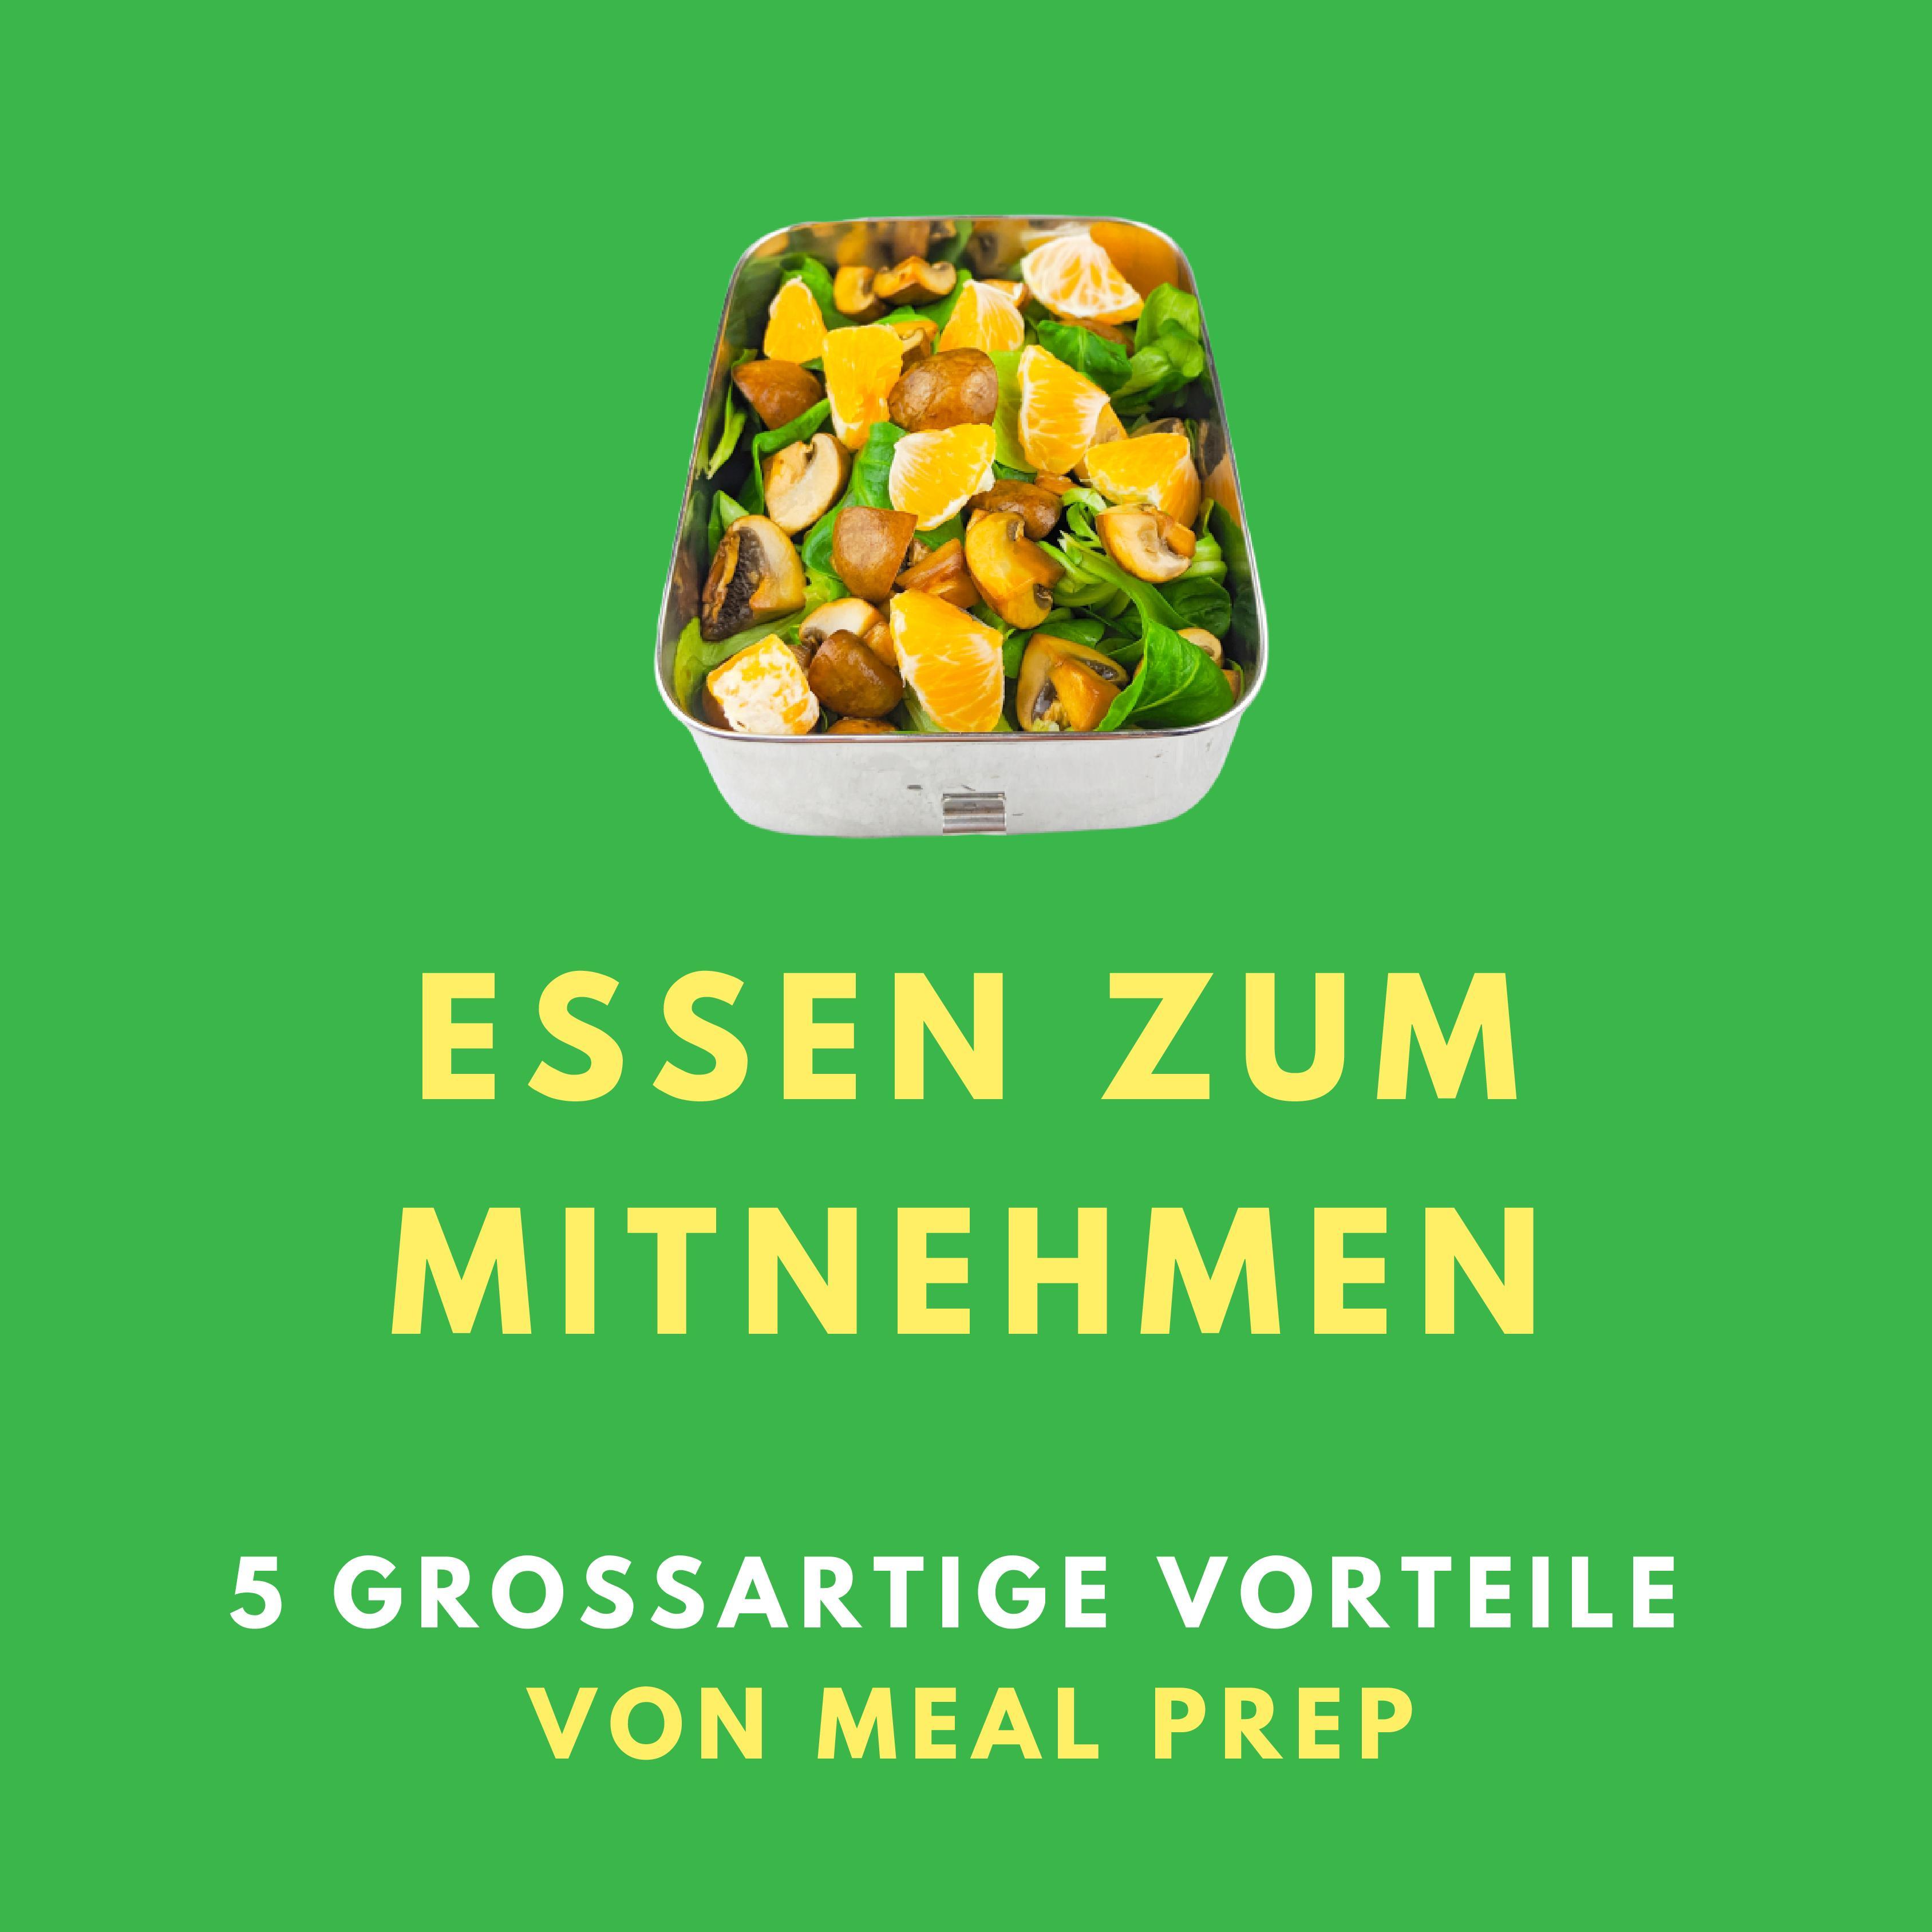 Essen zum Mitnehmen-Meal Prep-Meal Prep vegan-OWAO